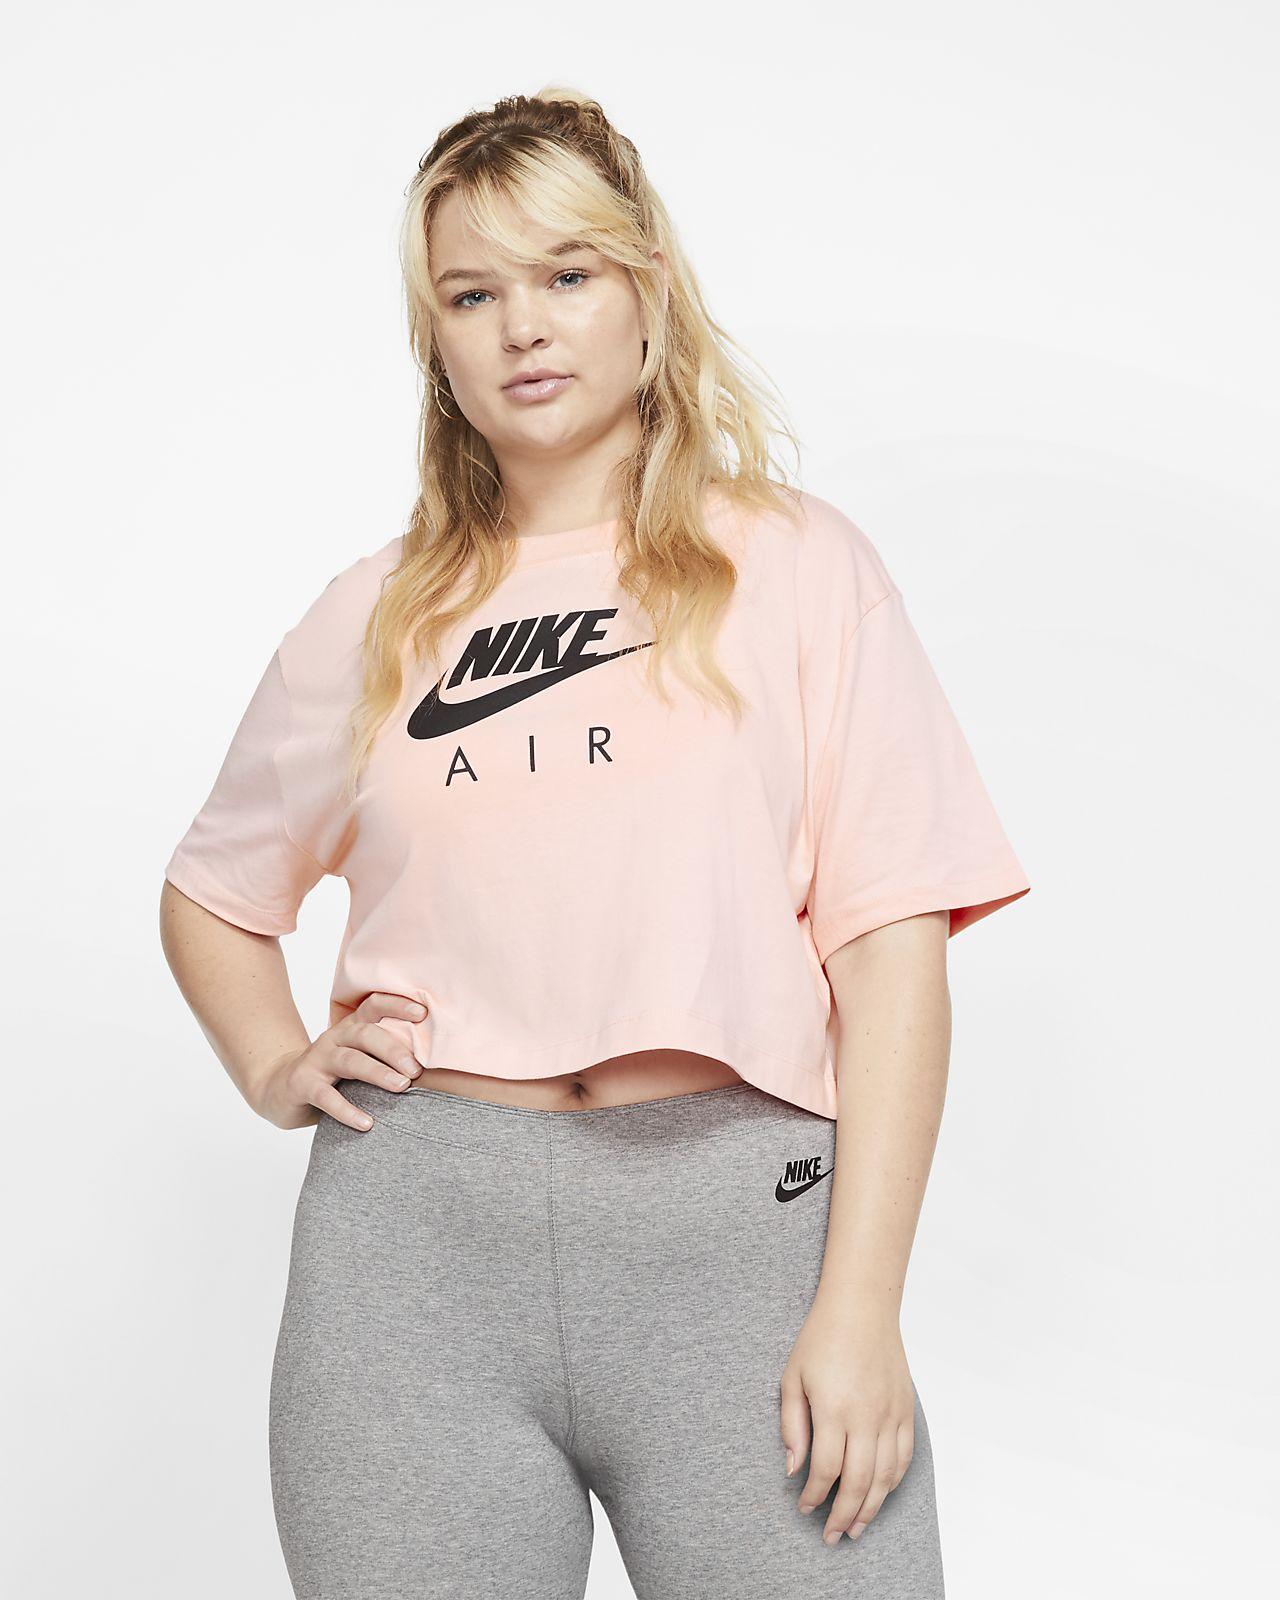 Prenda para la parte superior de manga corta para mujer Nike Air (talla grande)